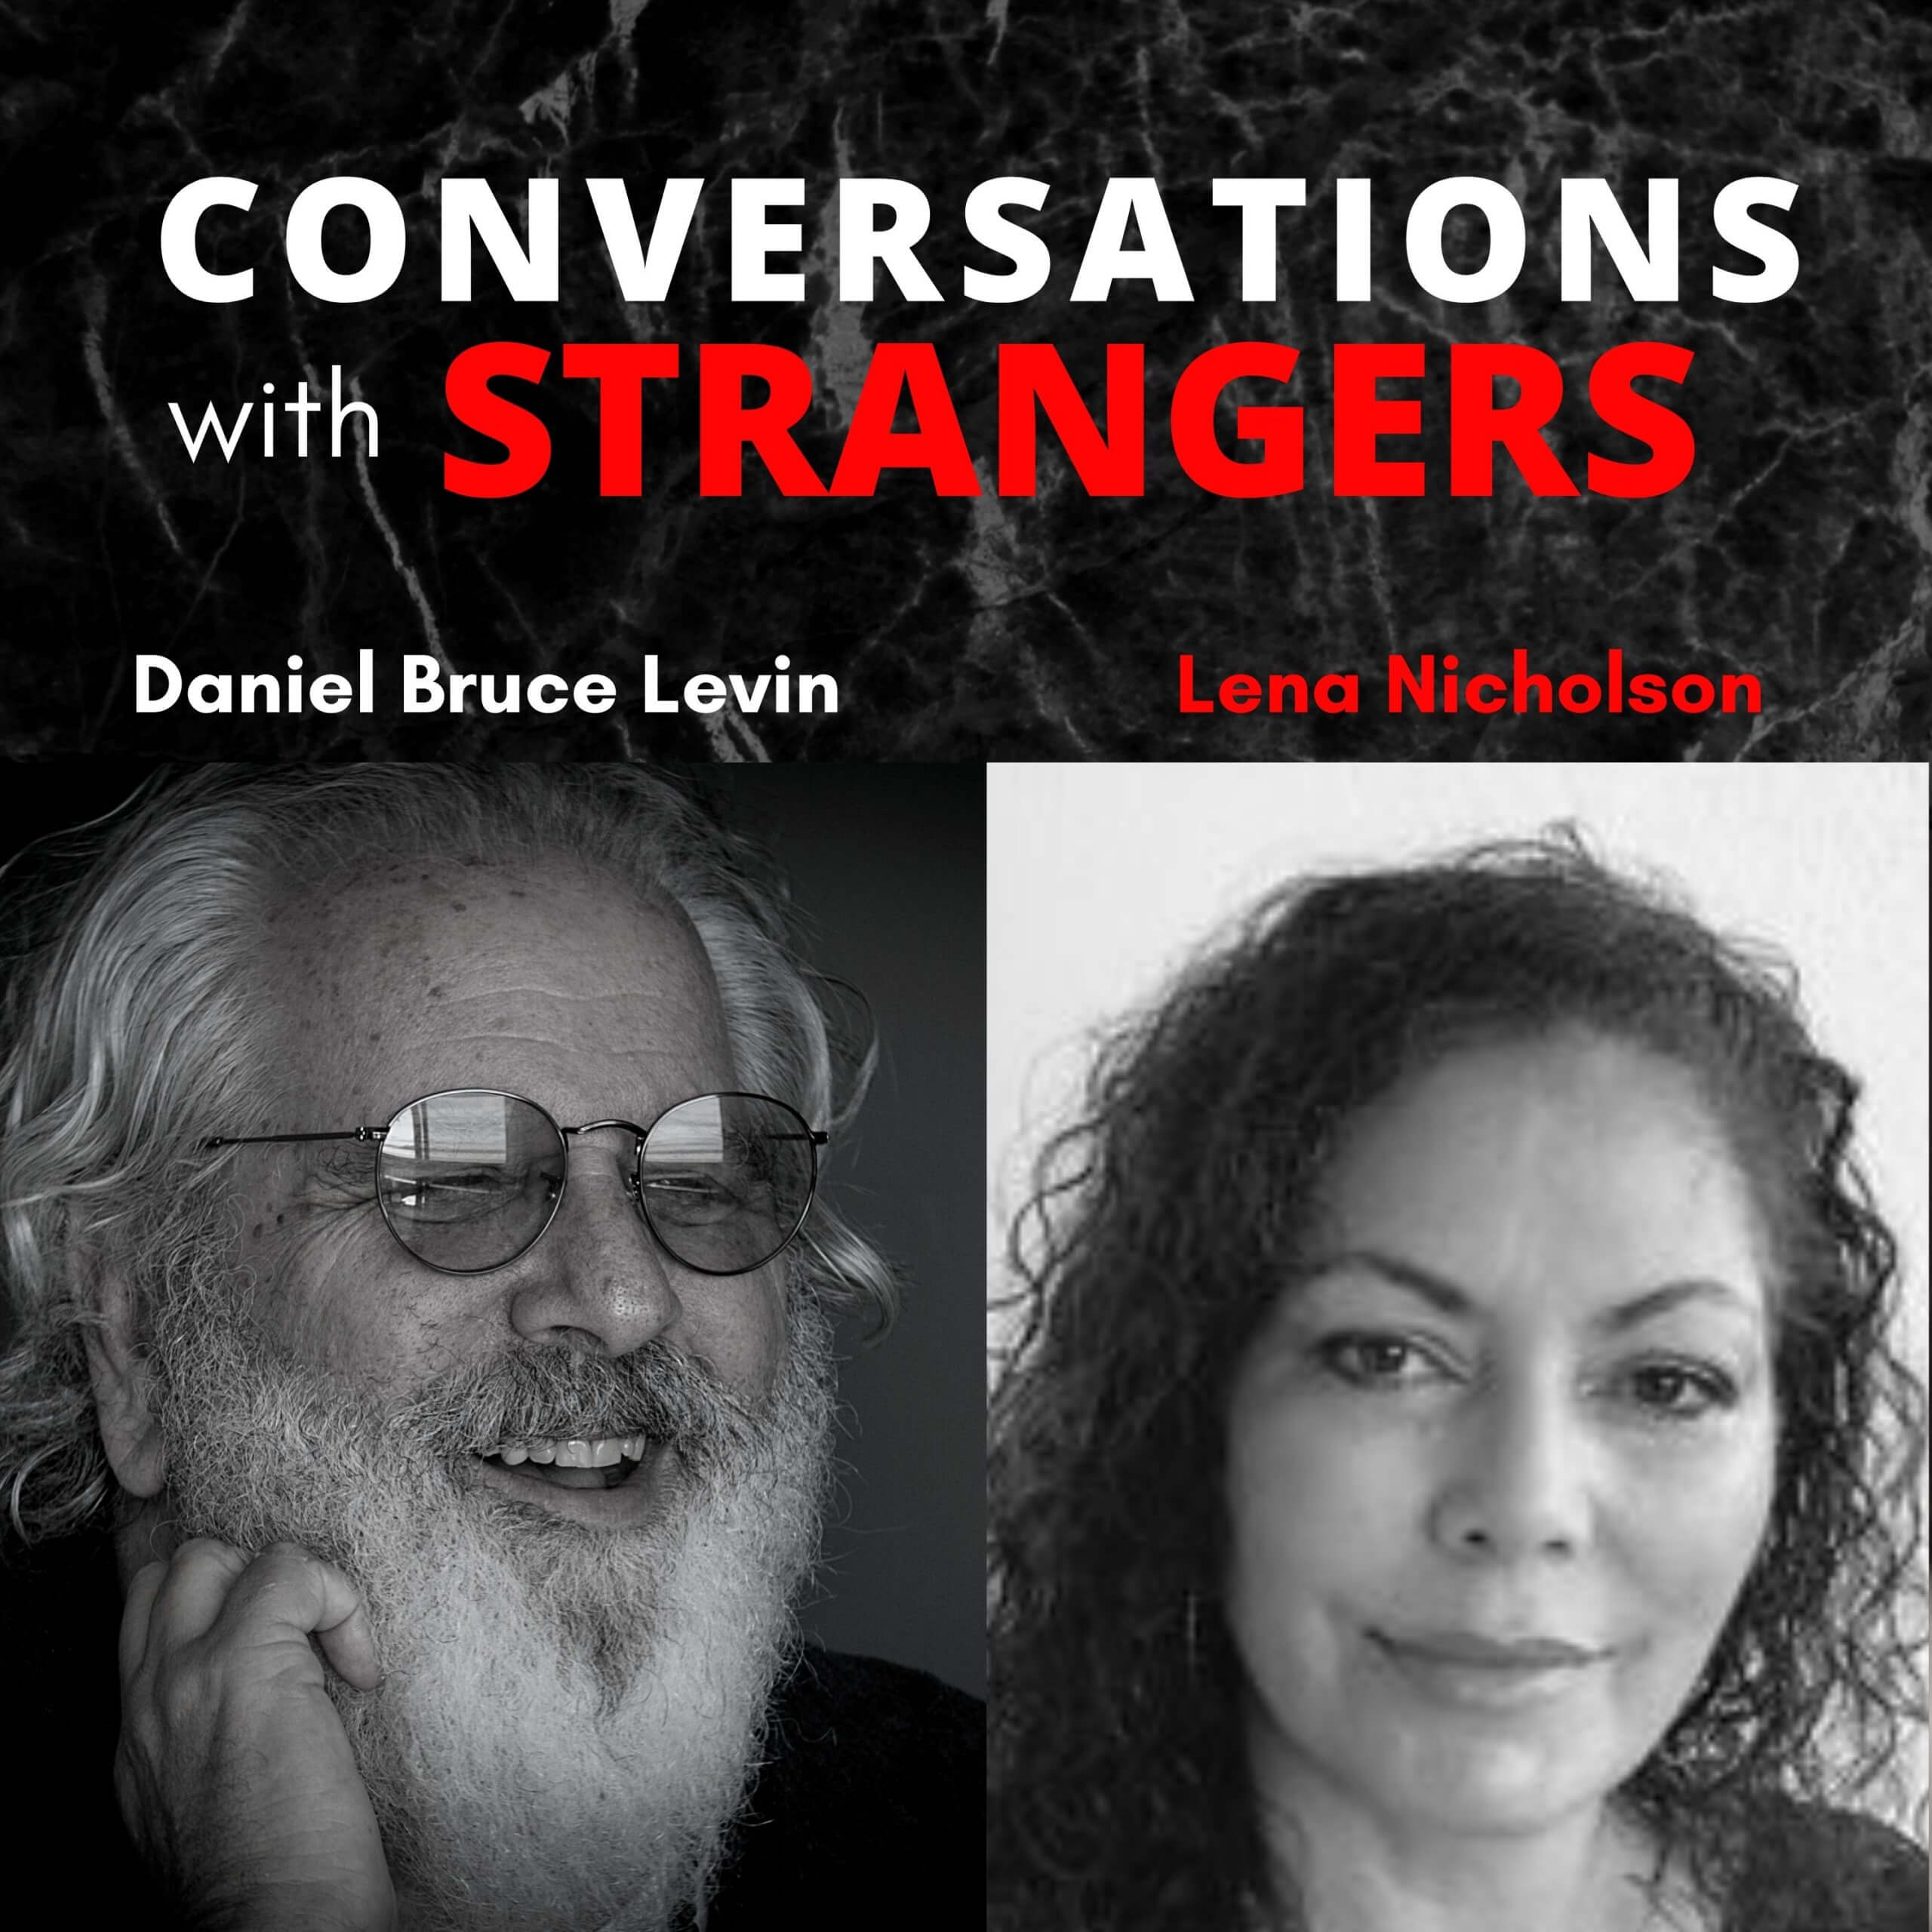 Conversations with Strangers feat. Lena Nicholson